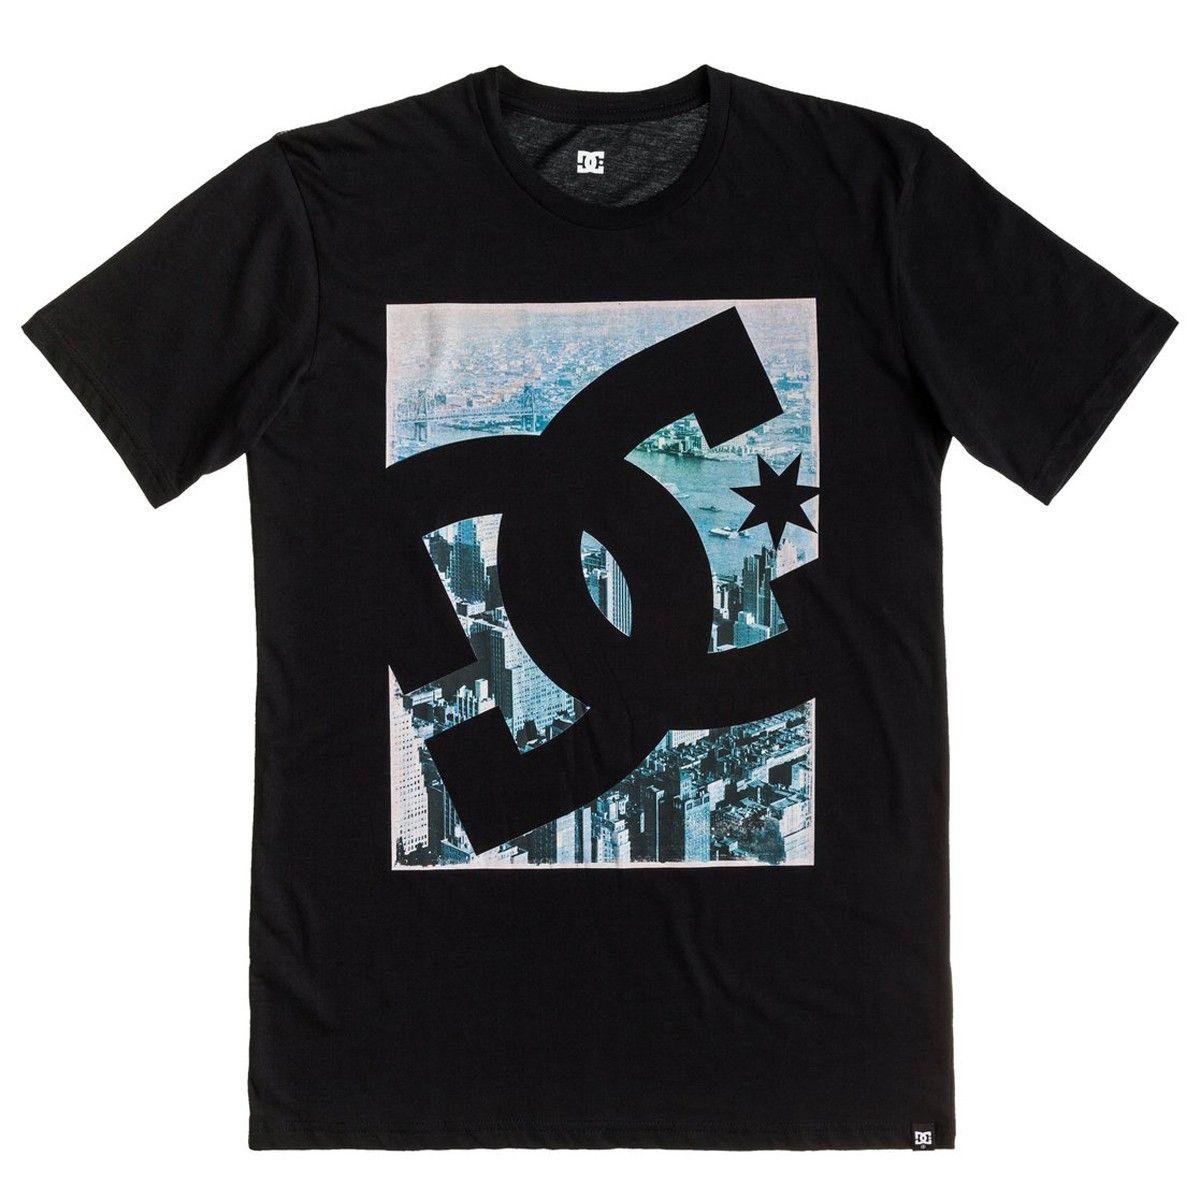 DC Shoes t-shirt Curb Appeal SS Tee DC black 32€ #dc #dcshoes #spring2013 #men #man #skate #skateboard #skateboarding #dcshoescousa #curbappeal #dccurbappeal #homme #chaussure #shoes #shoe #chaussures #skateshop